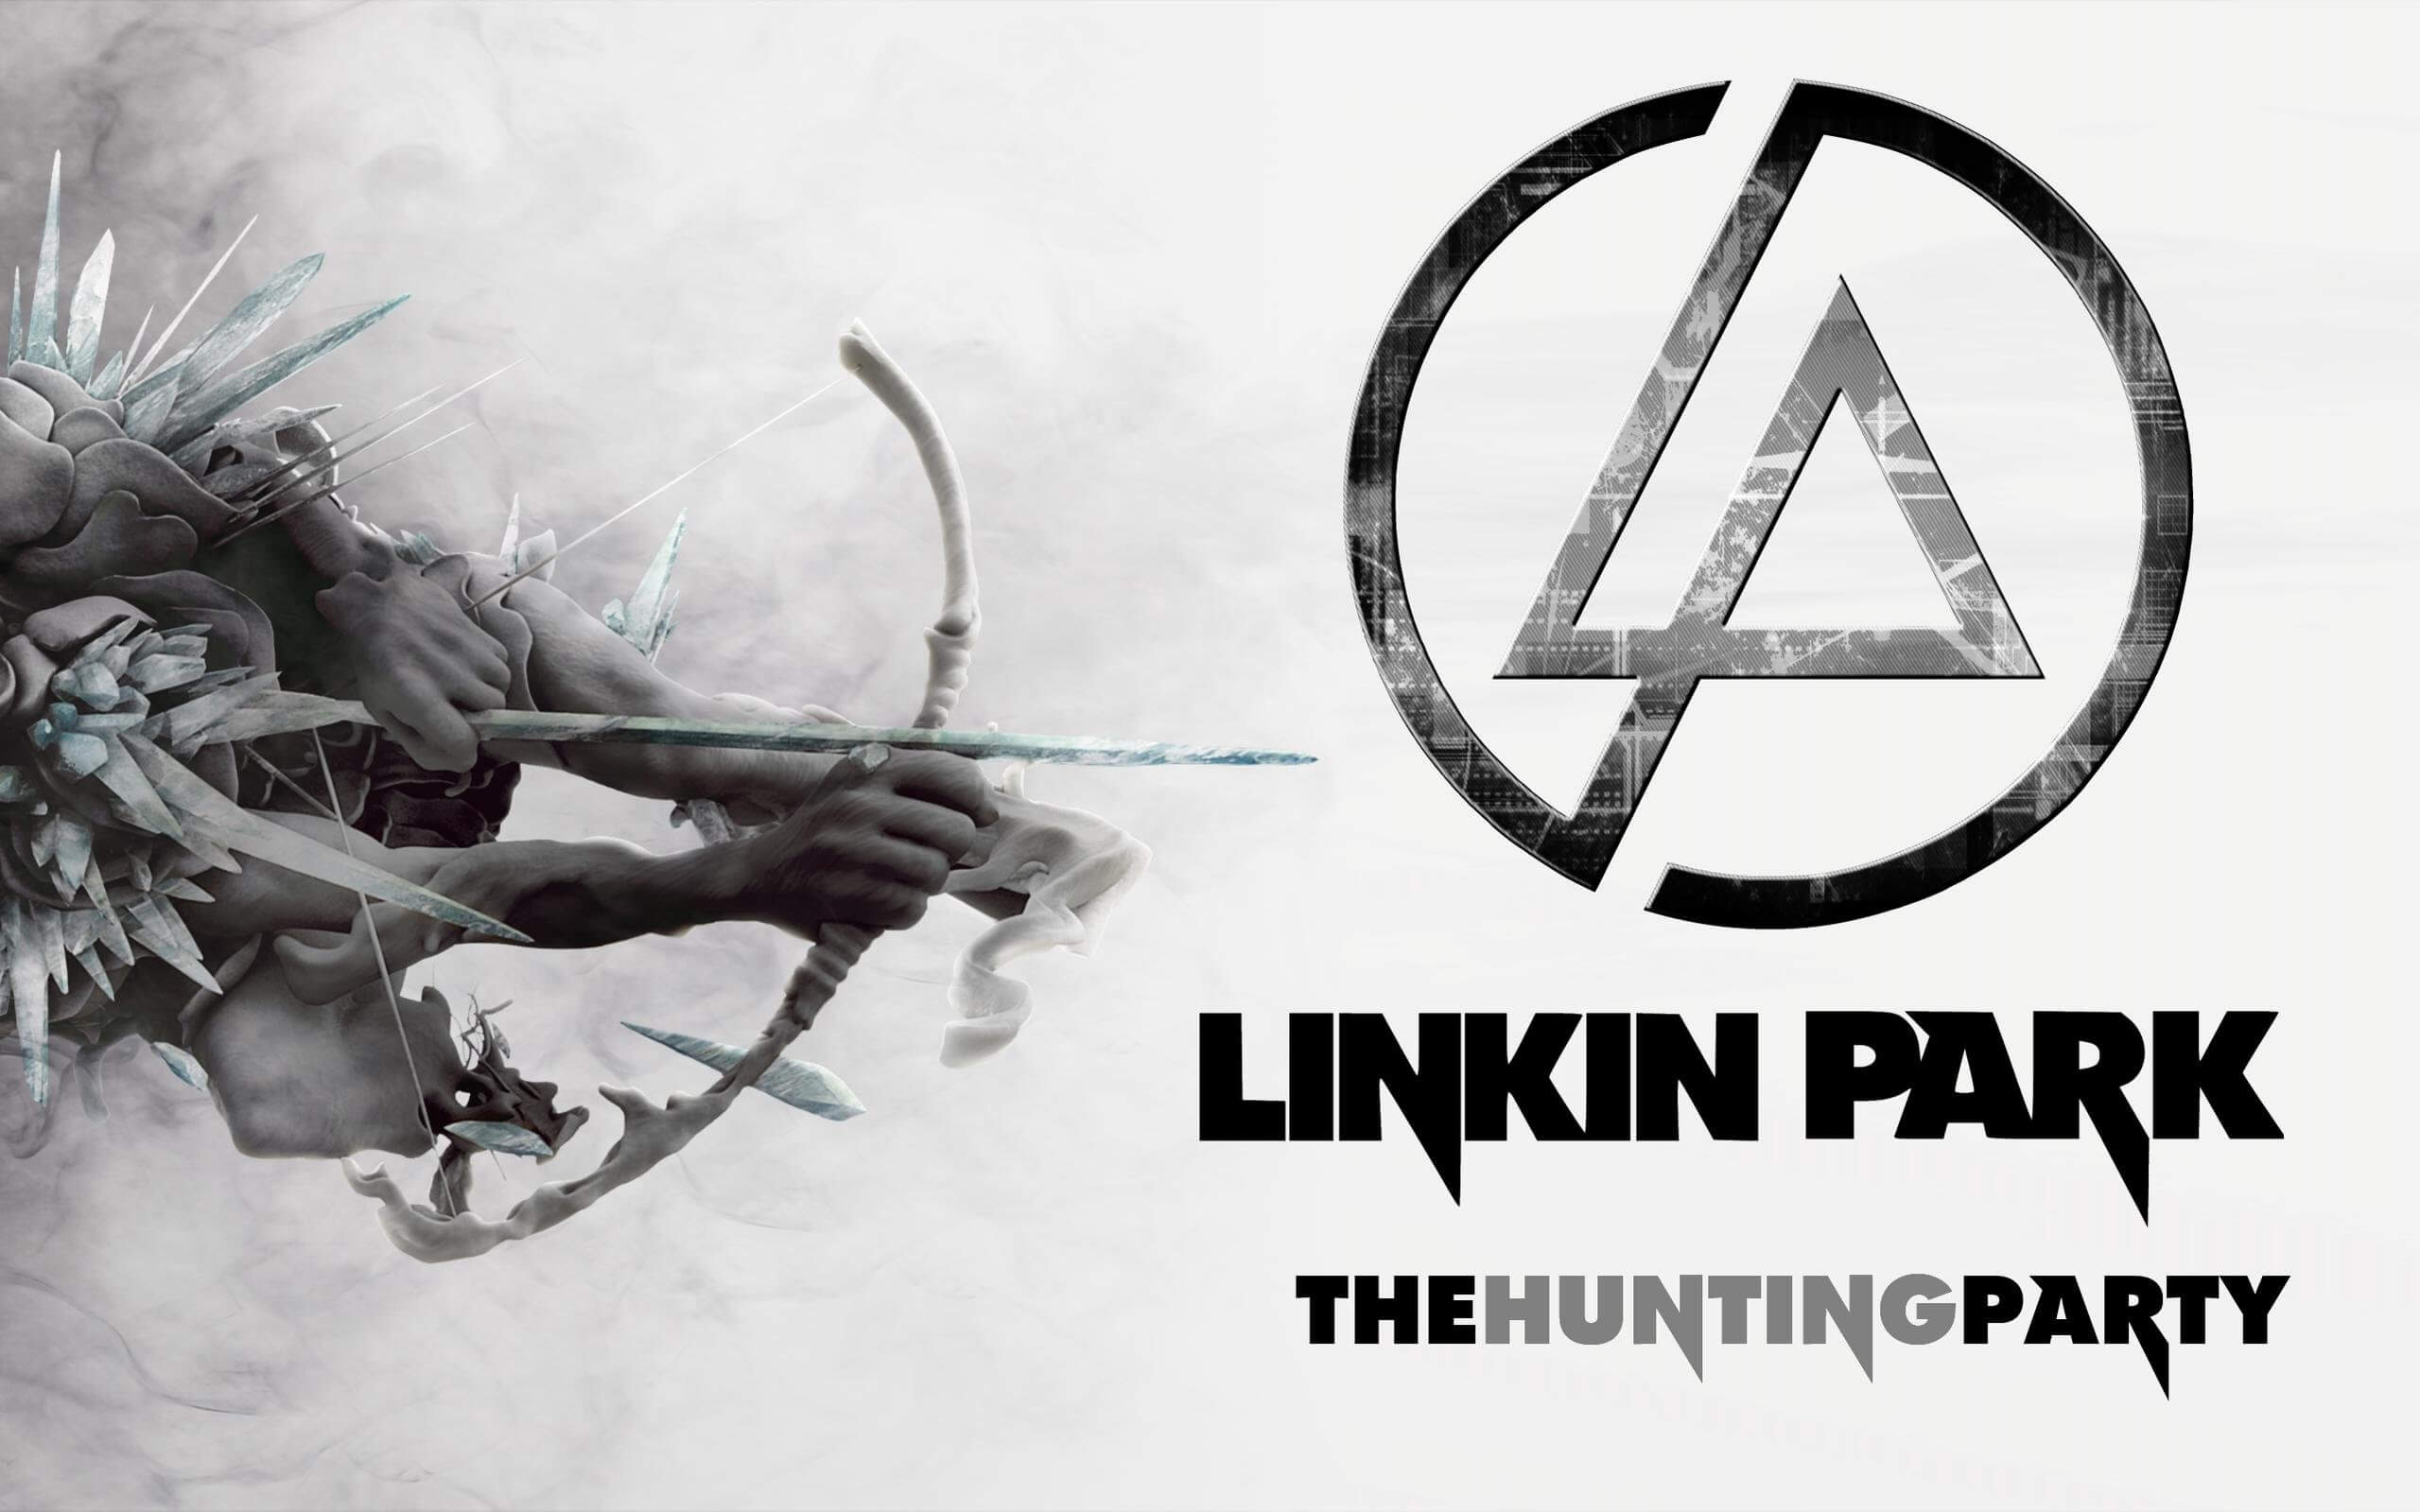 linkin park chiude rock in roma Linkin Park chiude Rock in Roma! copertina